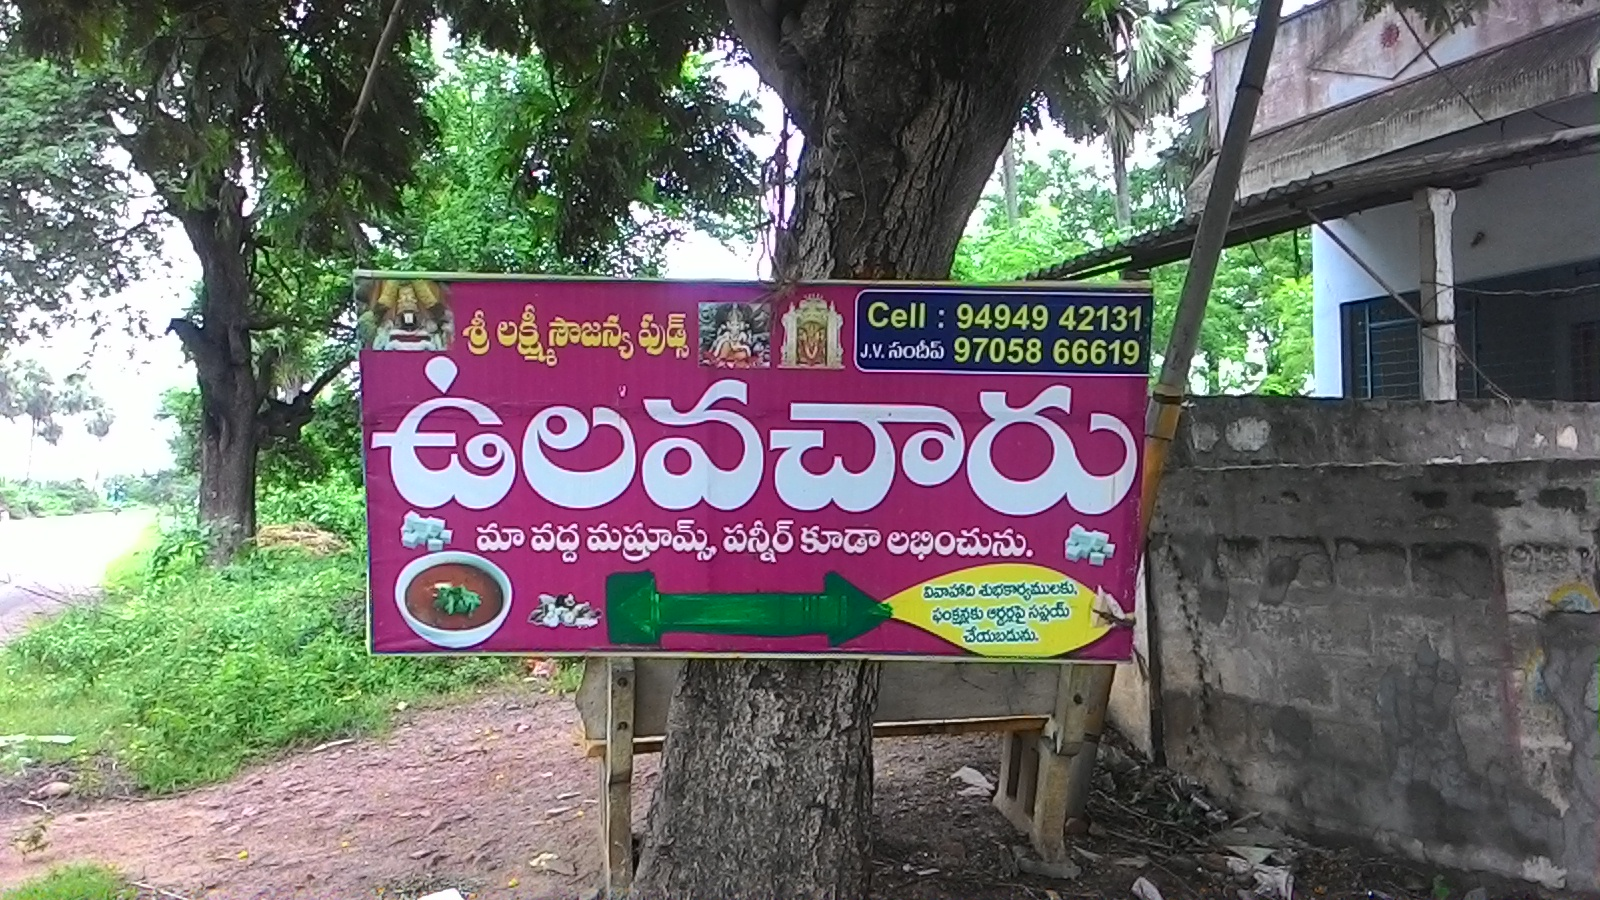 Top 10 Matrimonial Services in Vijayawada, Marriage Bureau, Agencies